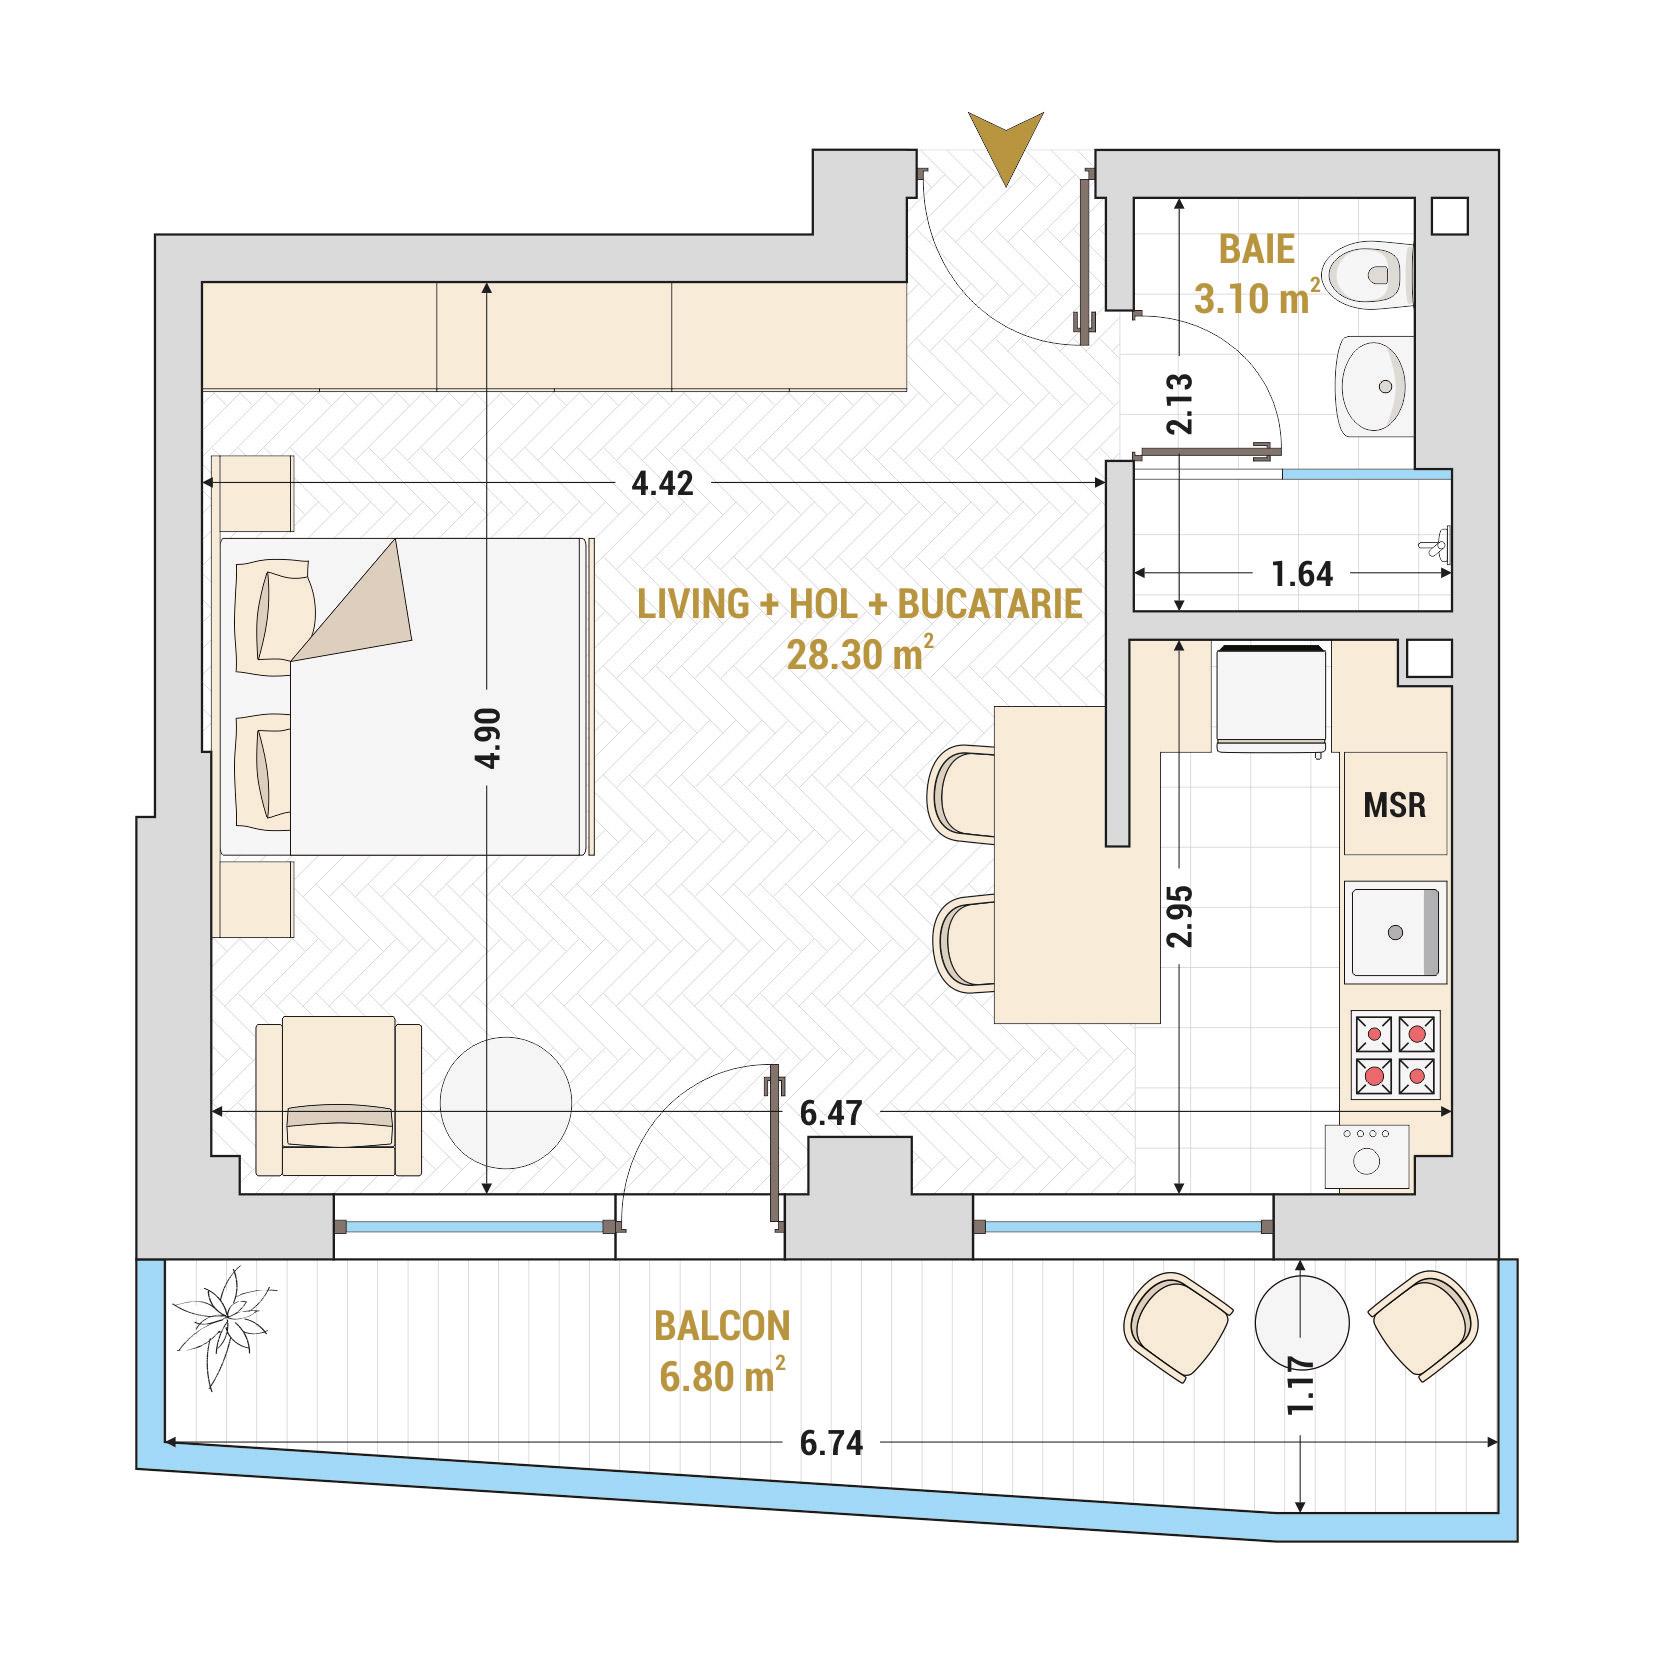 Garsoniere de vanzare Bucuresti - Catedral Residence - Marriott, Piata Unirii, 13 Septembrie, Izvor - Tip 2 - T1A